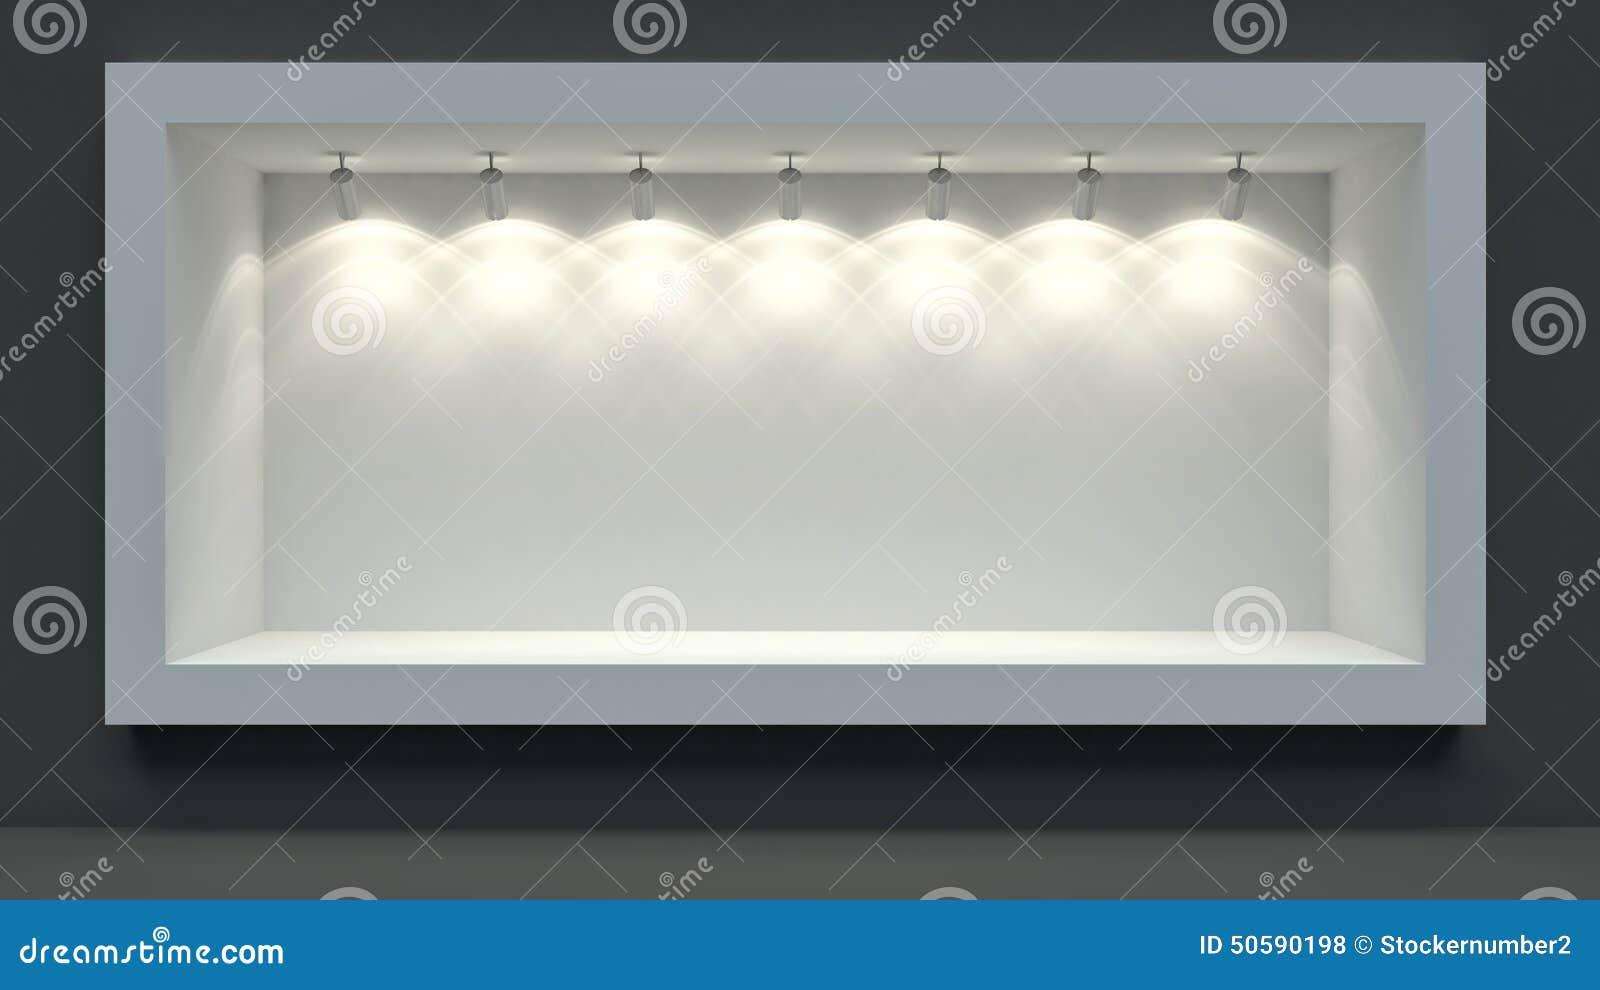 Led bulbs business plan